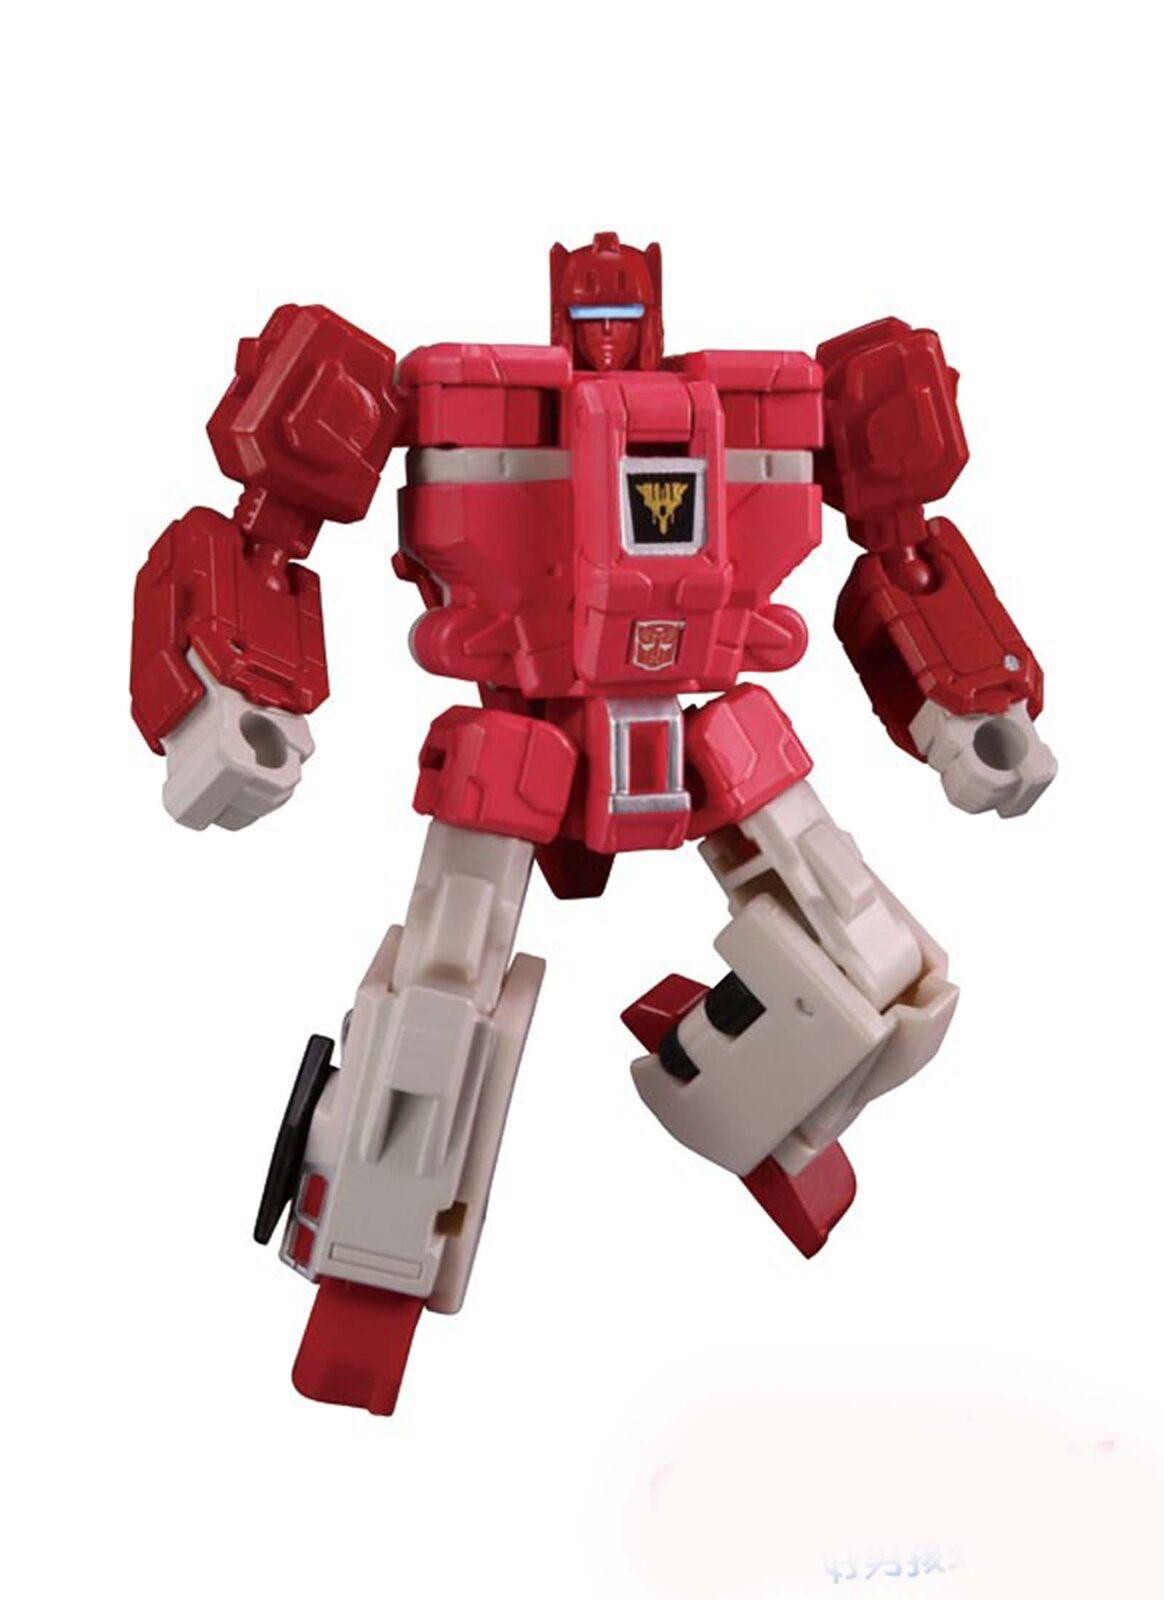 New Transformers Legends LG58 Autobot Clones Bots Fastlane Cloudraker Robot Hot